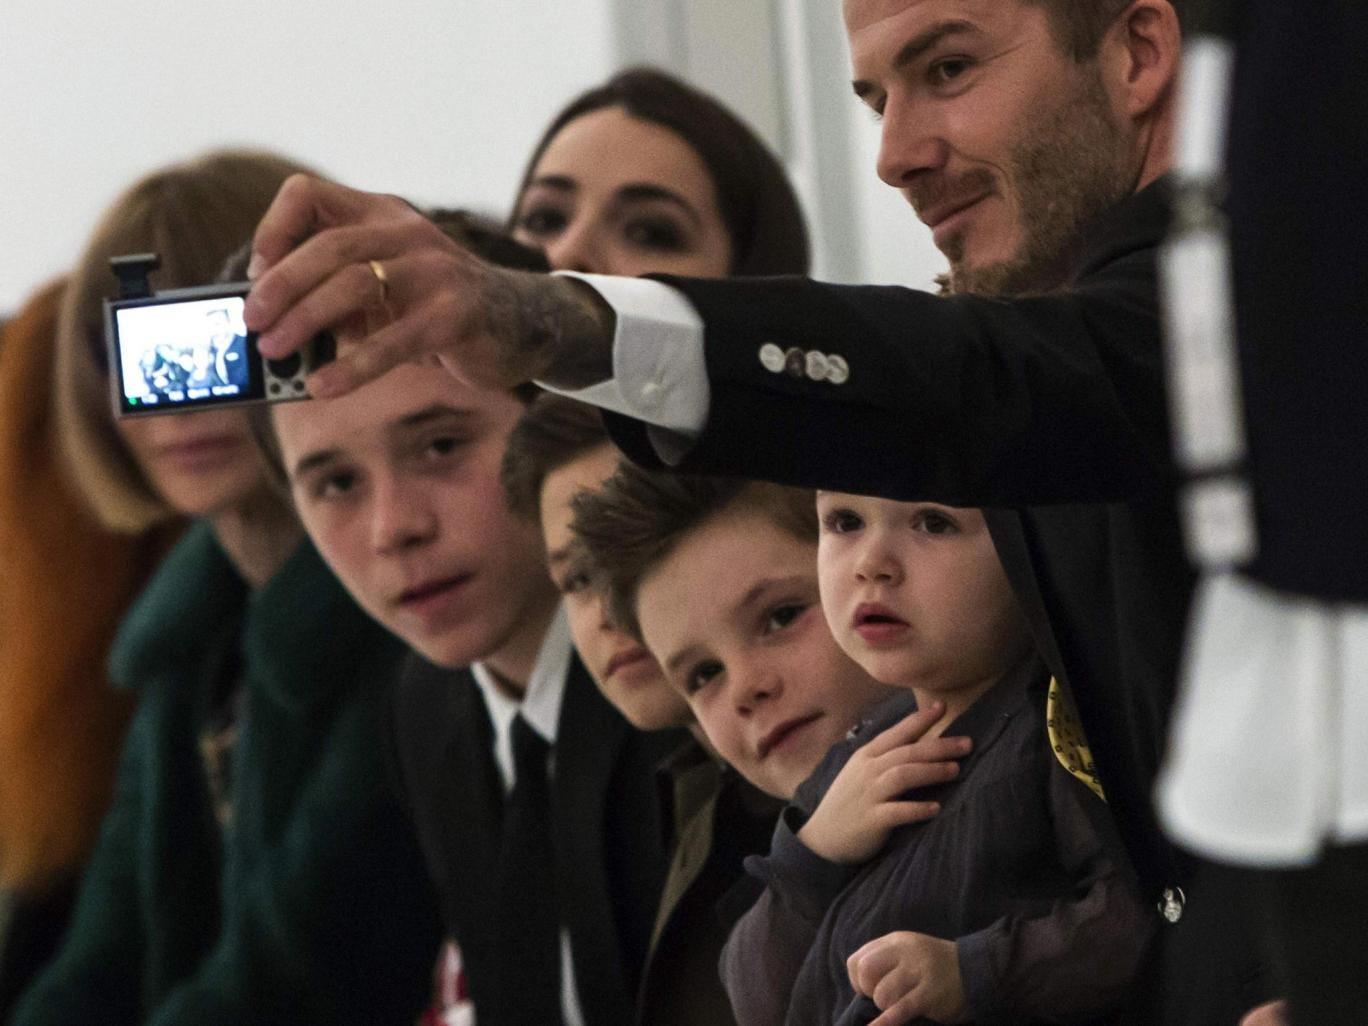 David Beckham photographs his children on the front row